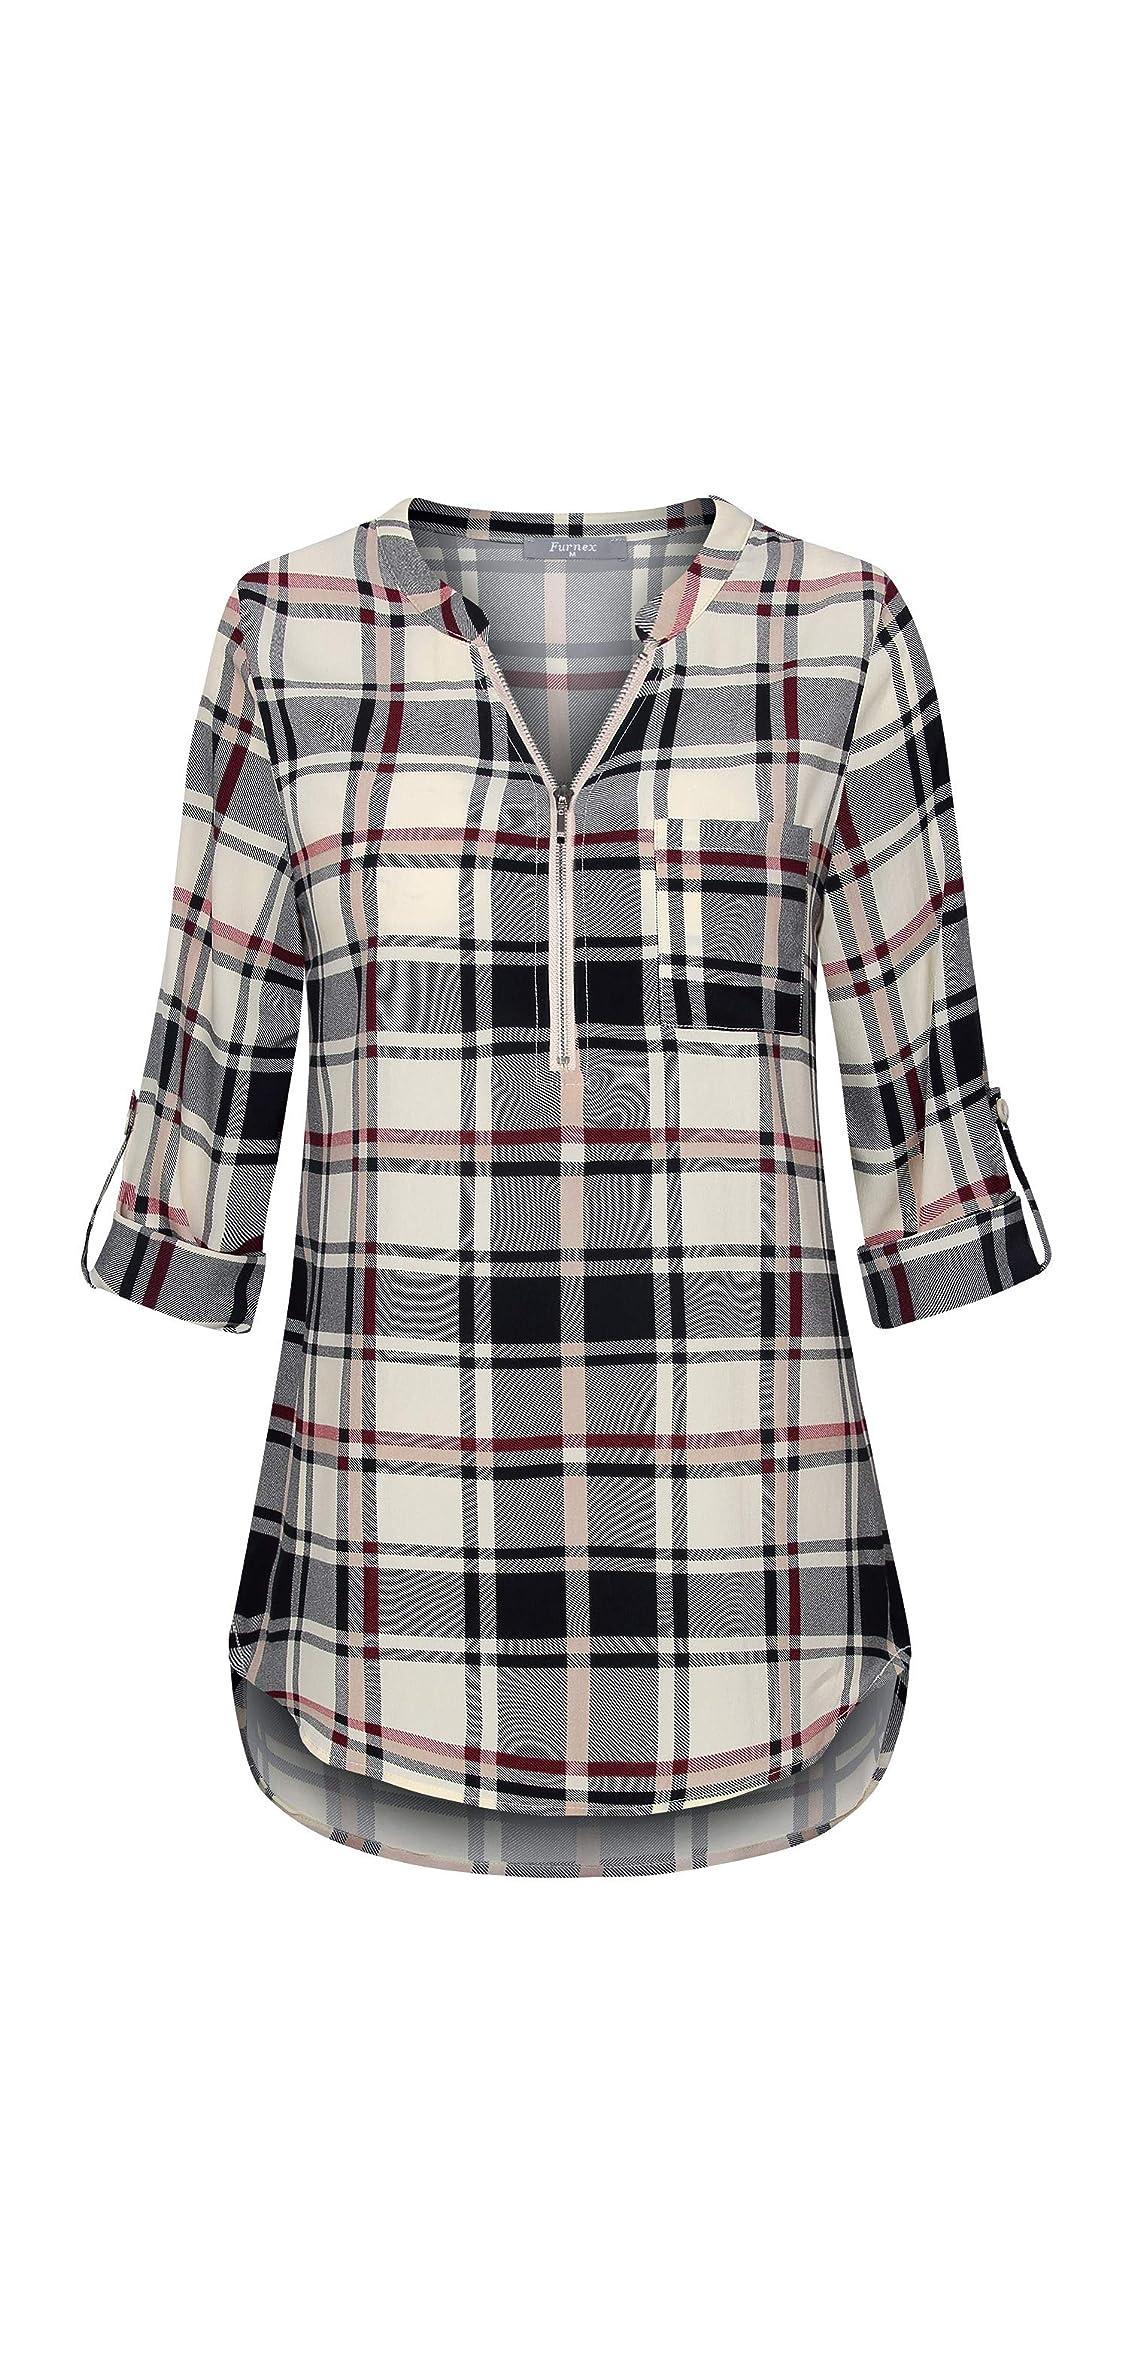 Women's V Neck Chiffon Blouse Half Zip Up Casual Tunic